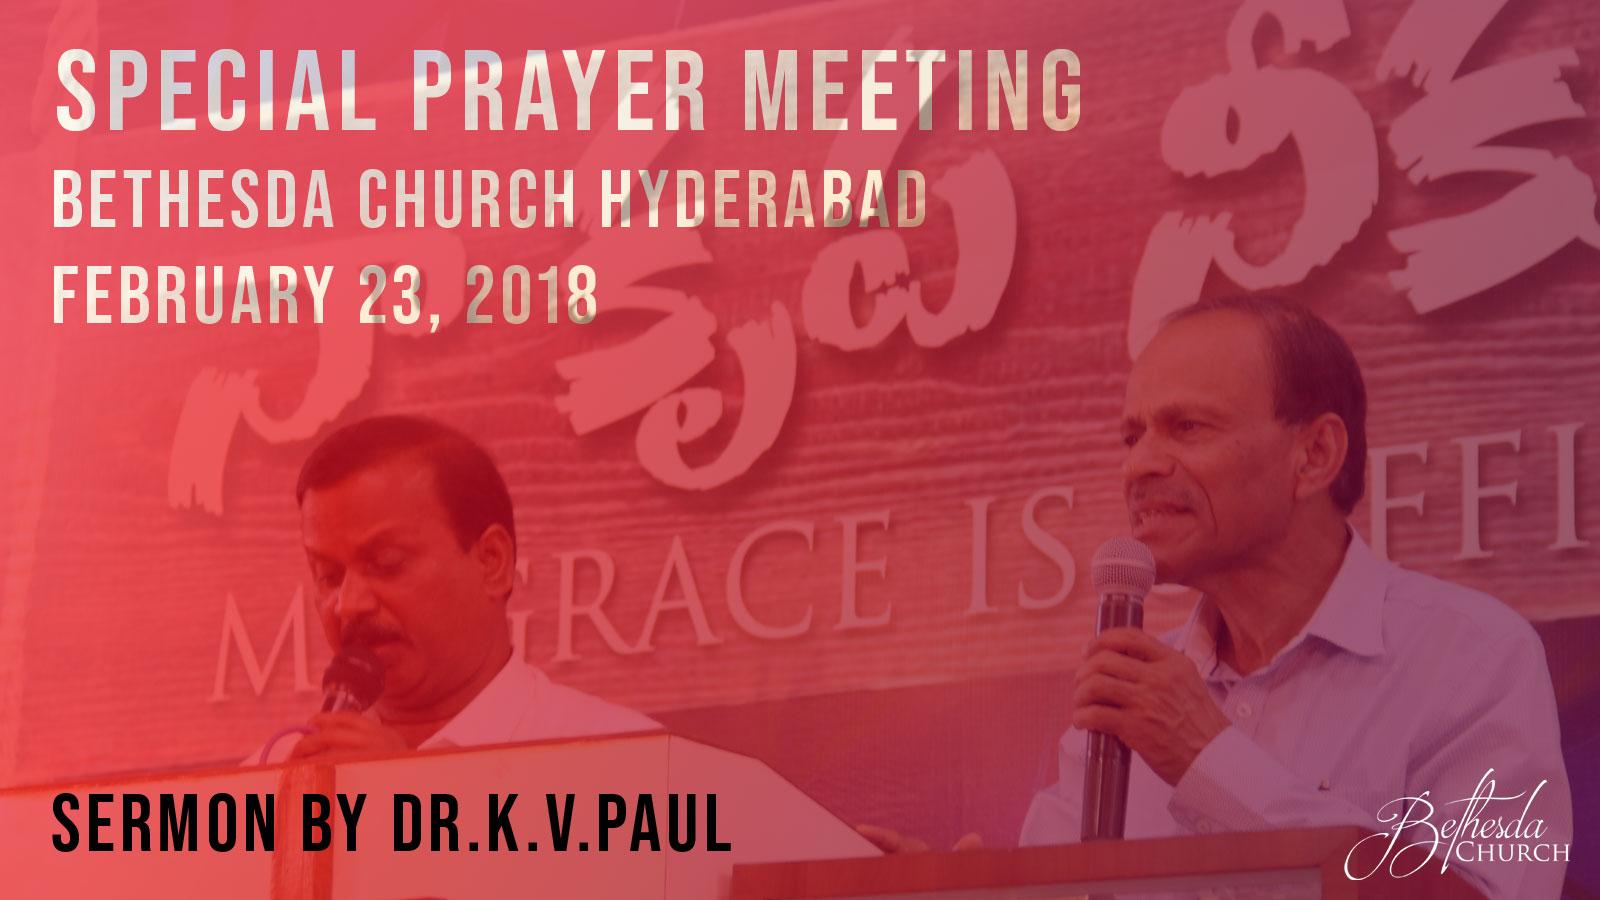 Special Prayer Meeting (A350)